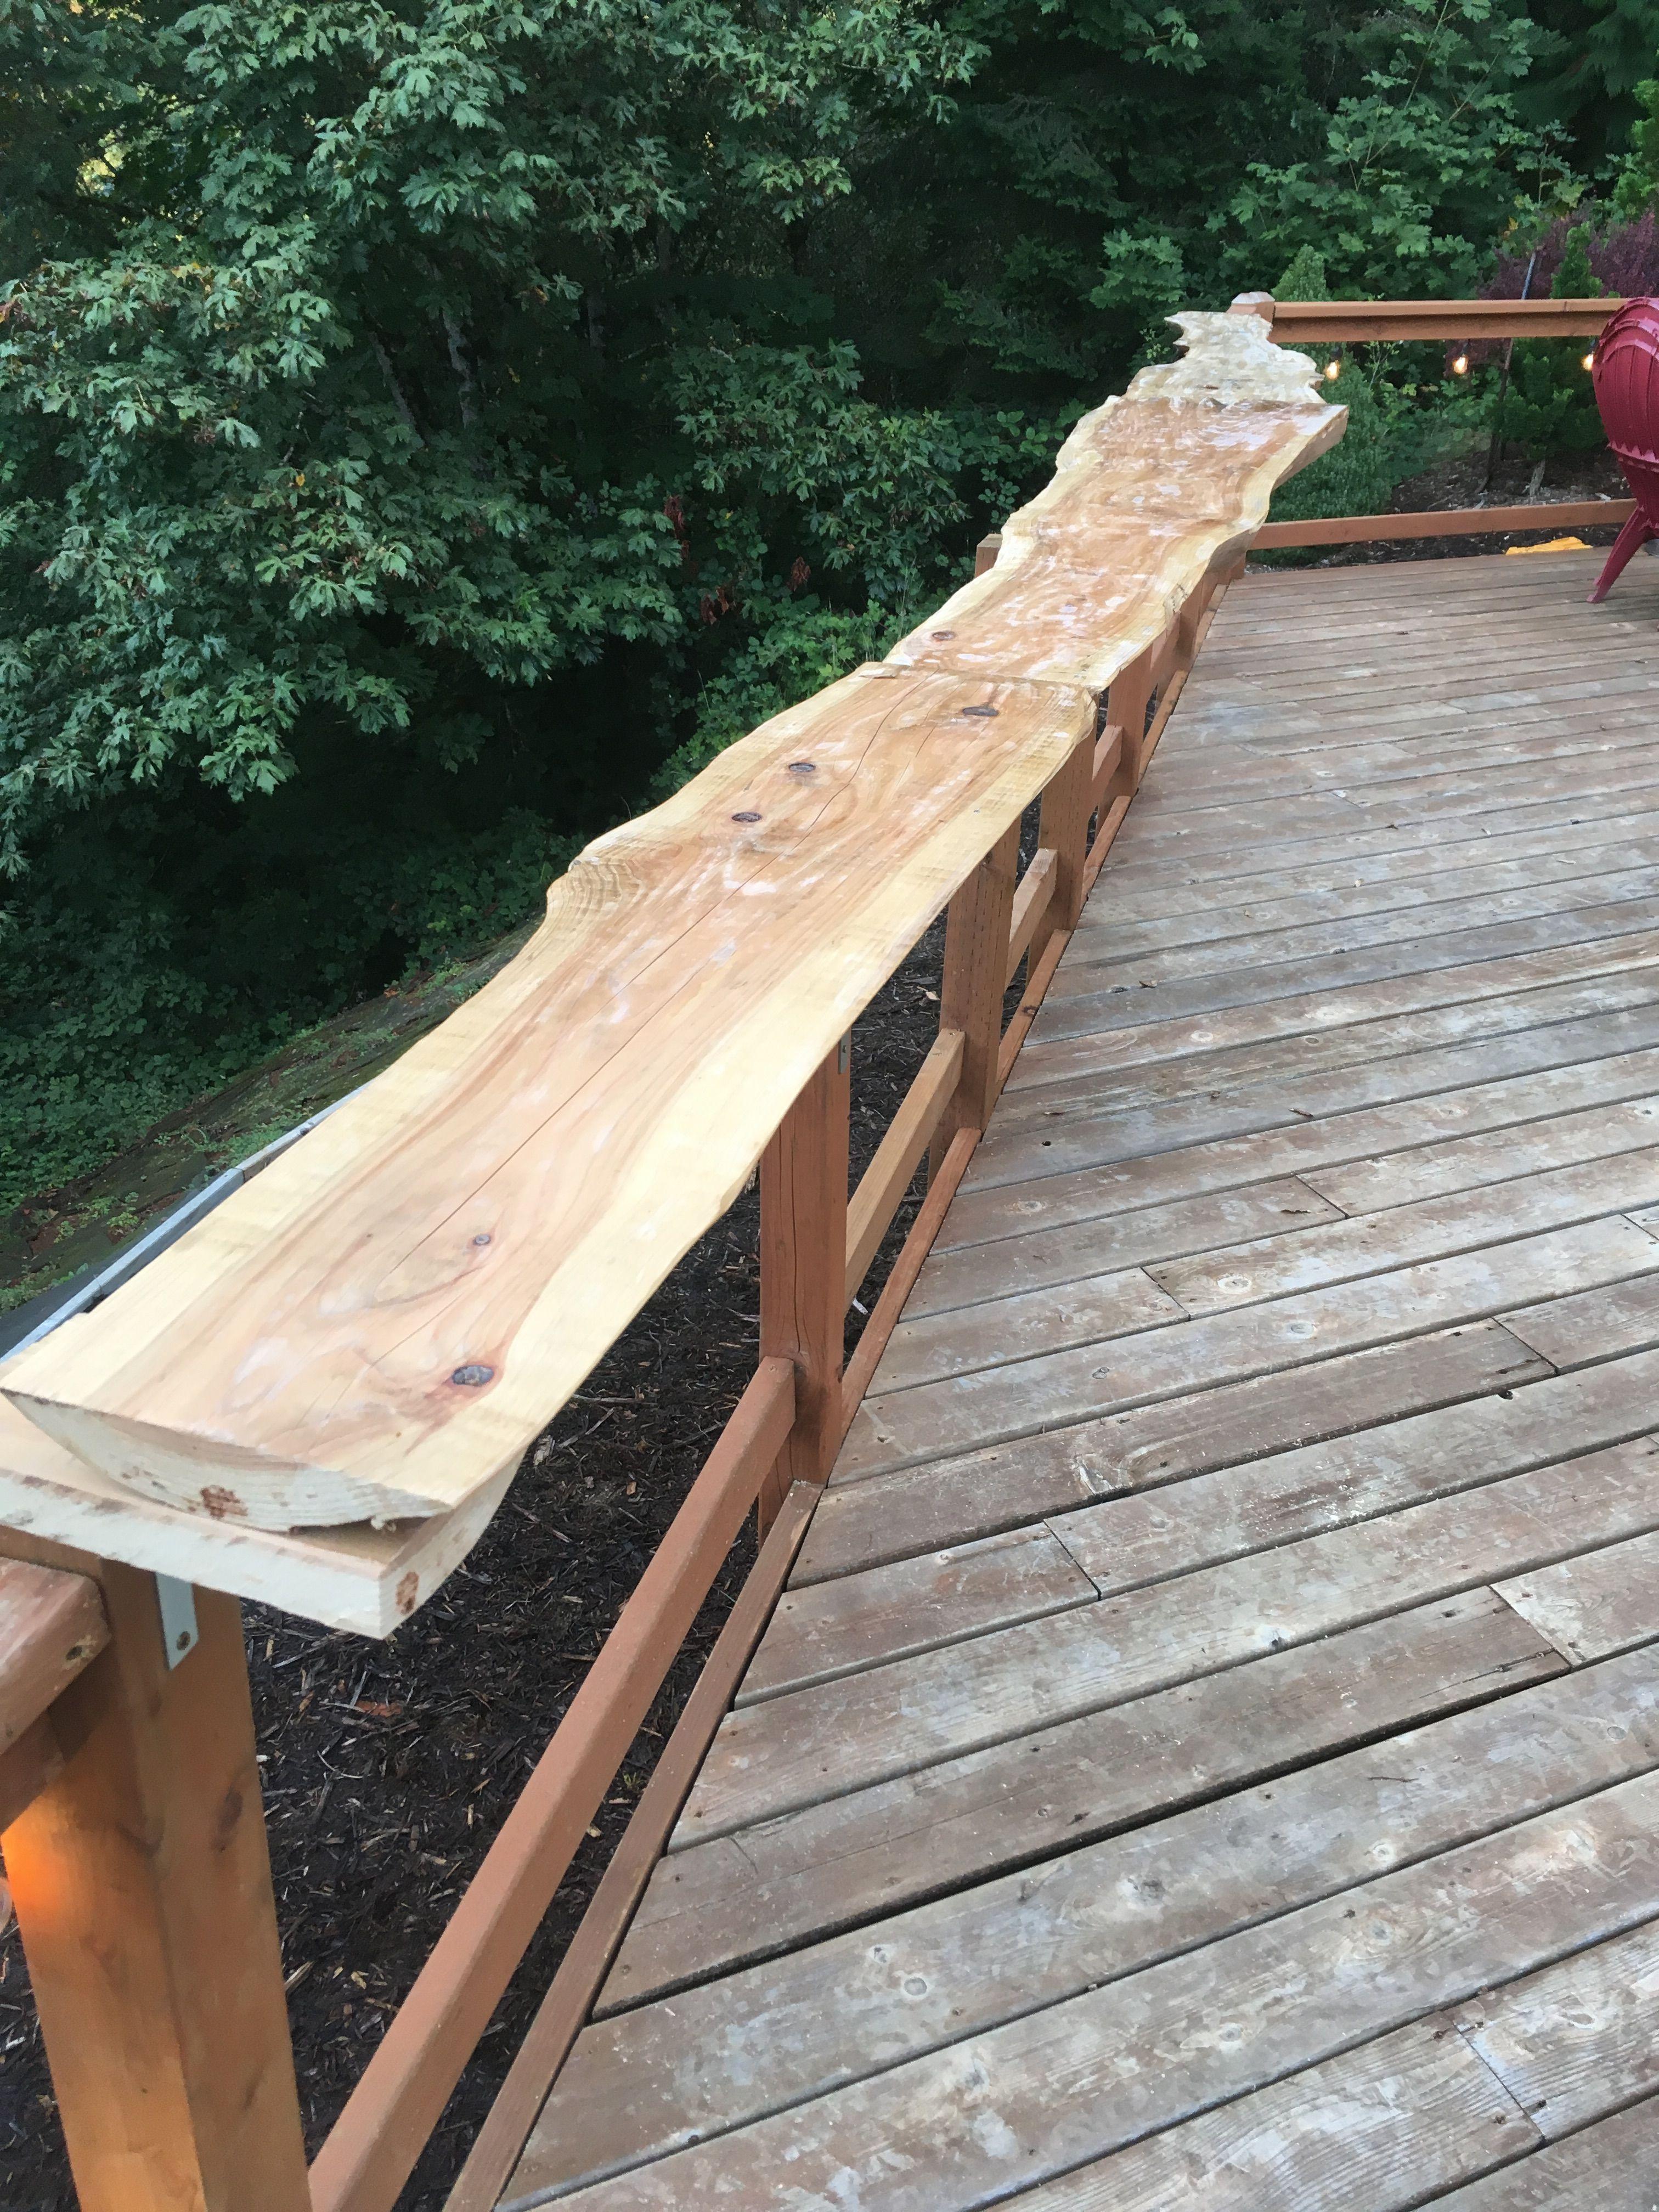 Reclaimed Wood For Deck Railing Bar Top Wood Deck Railing Diy Deck Deck Railings